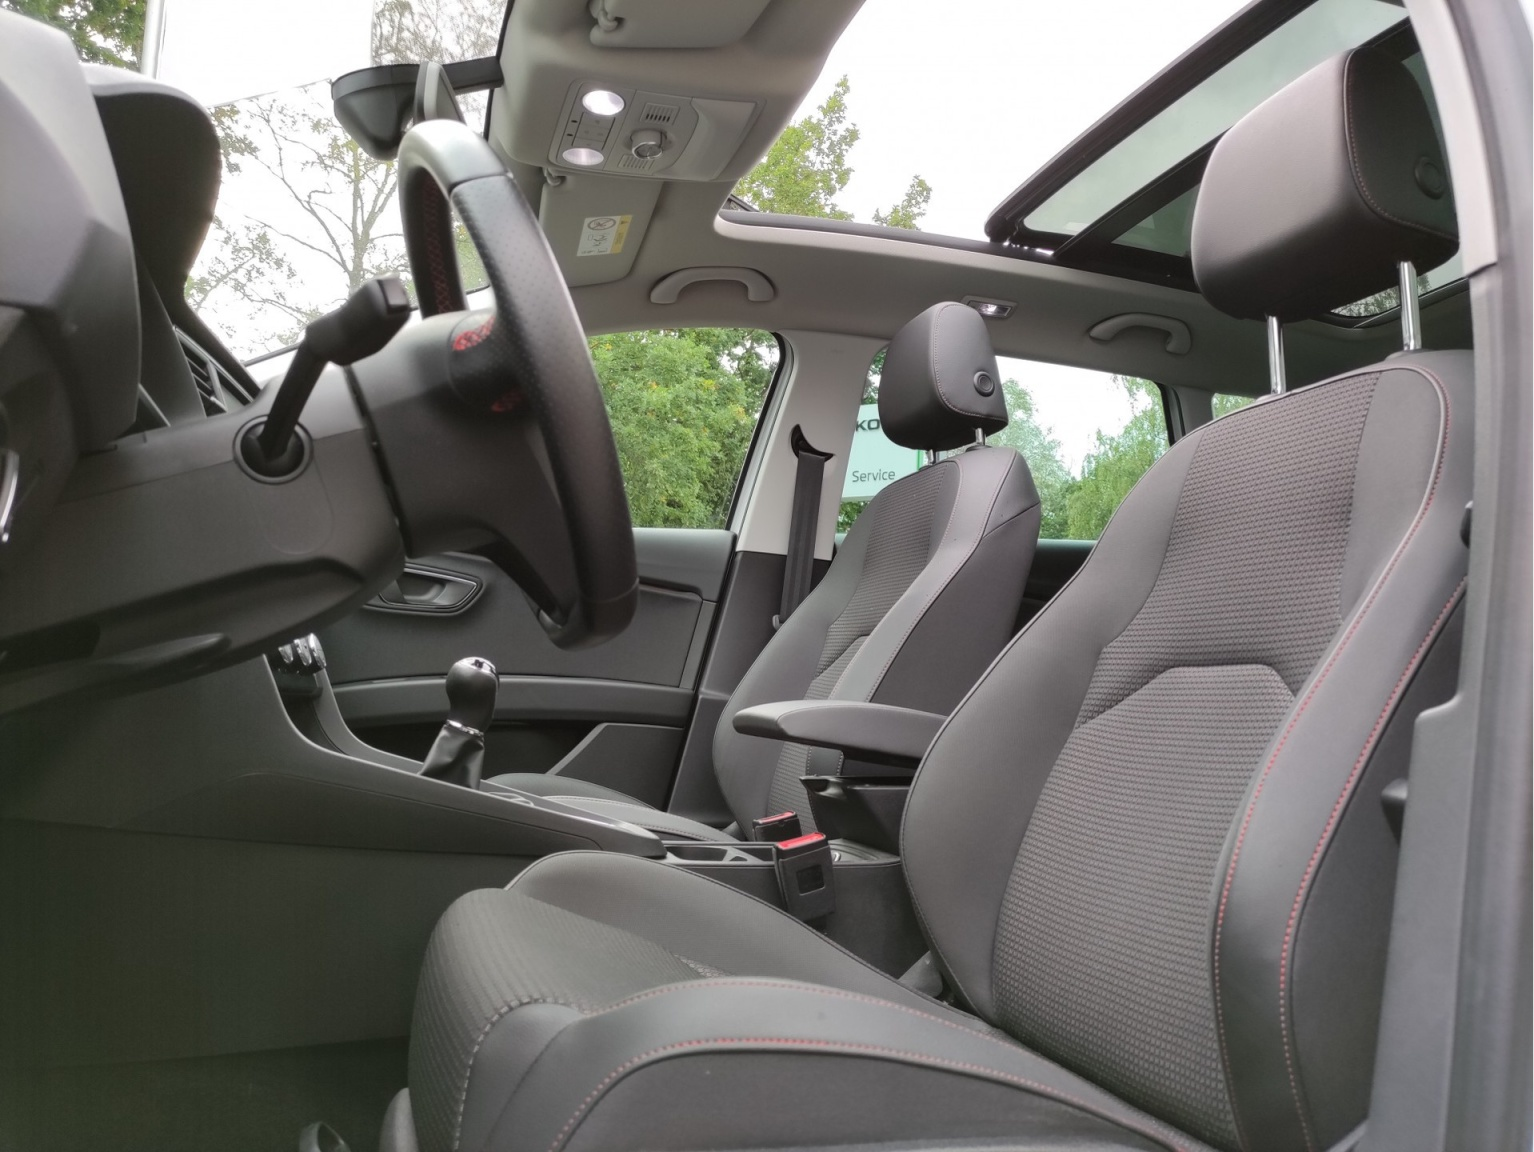 SEAT-Leon-26